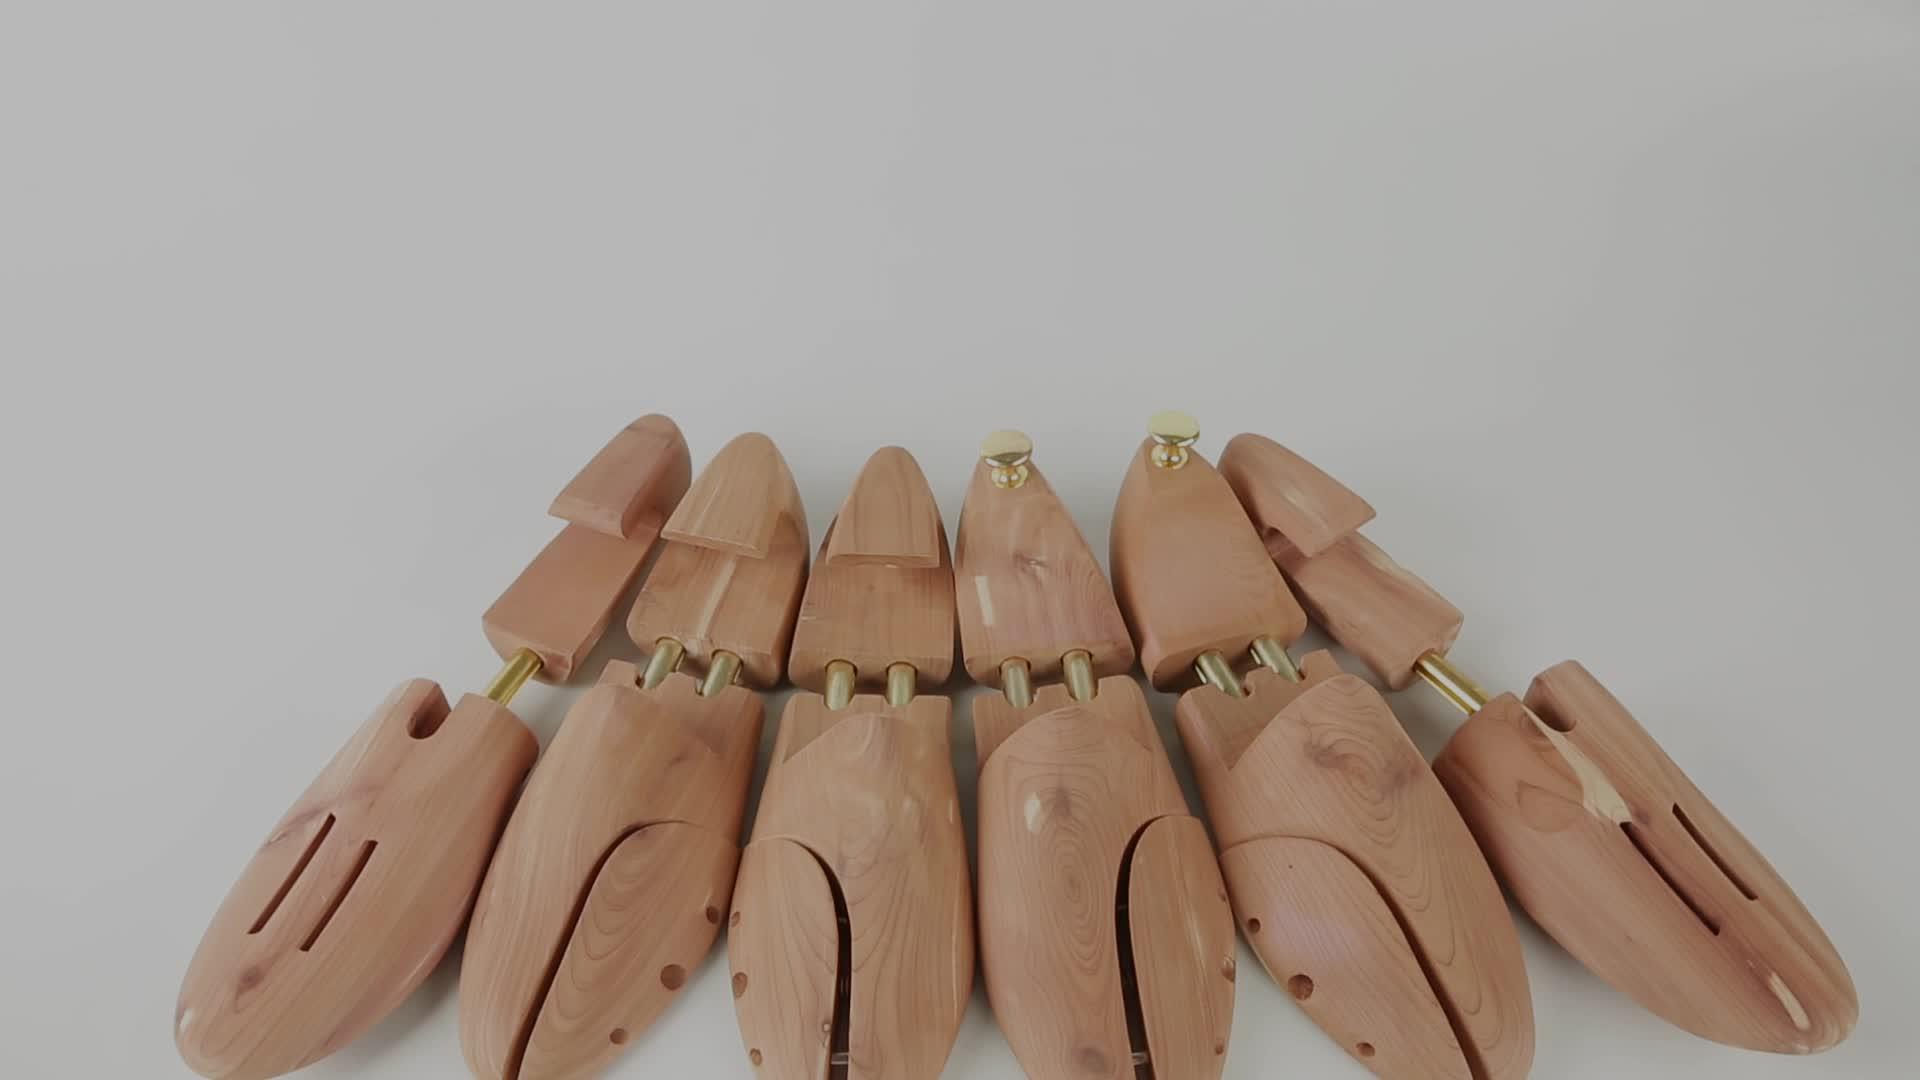 Hot Sale Fashion Custom Adjustable Metal Tubes Cedar Wooden Shoe Stretcher